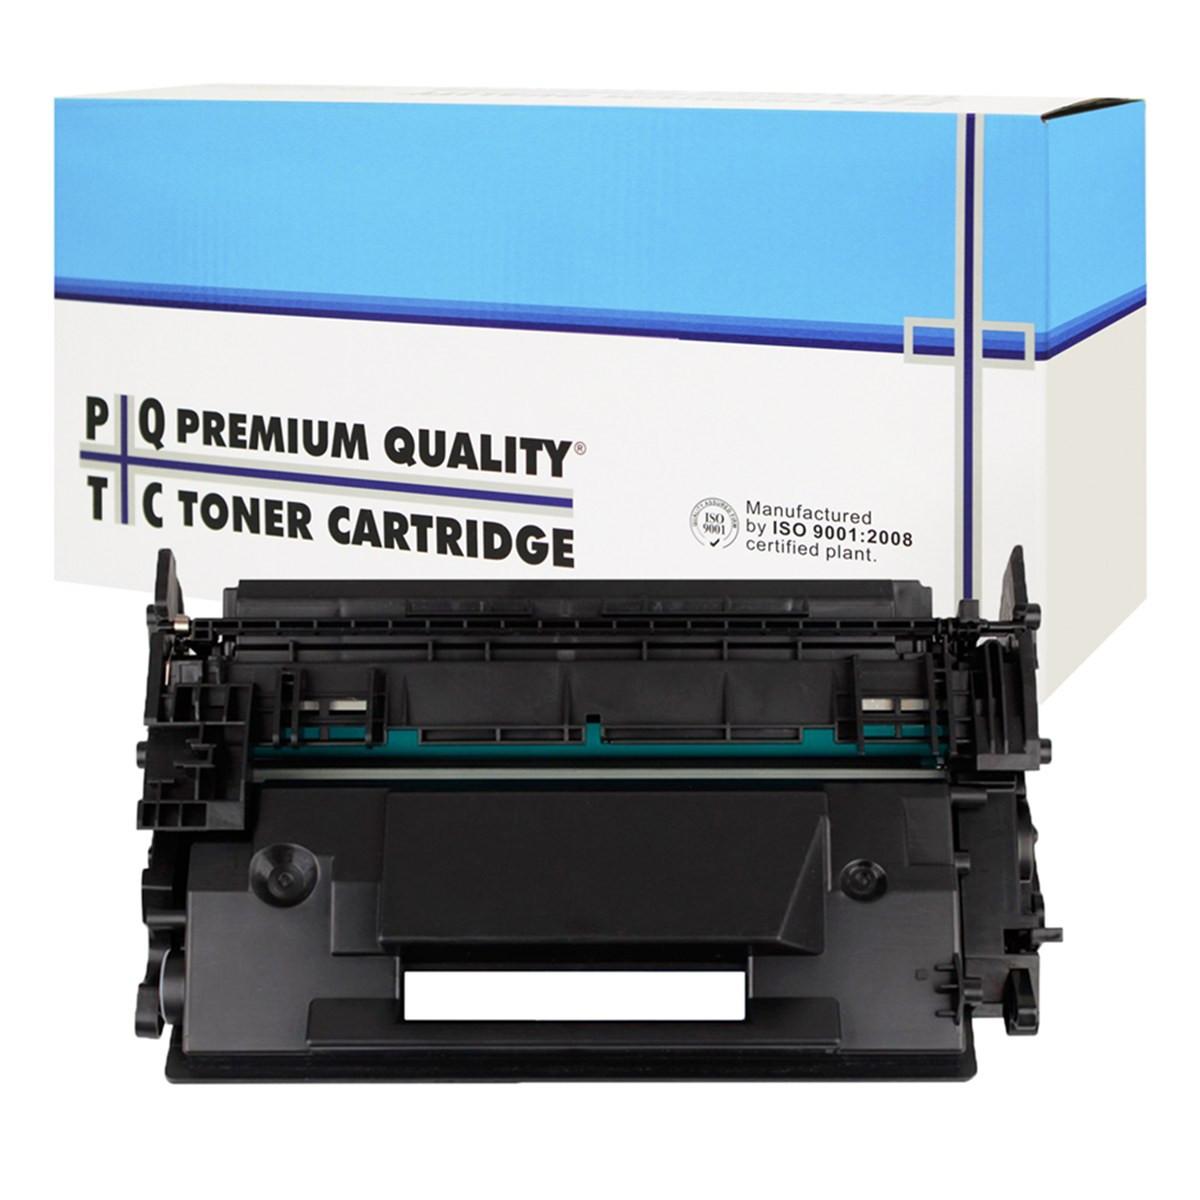 Toner Compatível com HP CF287A CF287AB | M501 M506N M506DN M527F M527DN M527Z | Premium Quality 9k